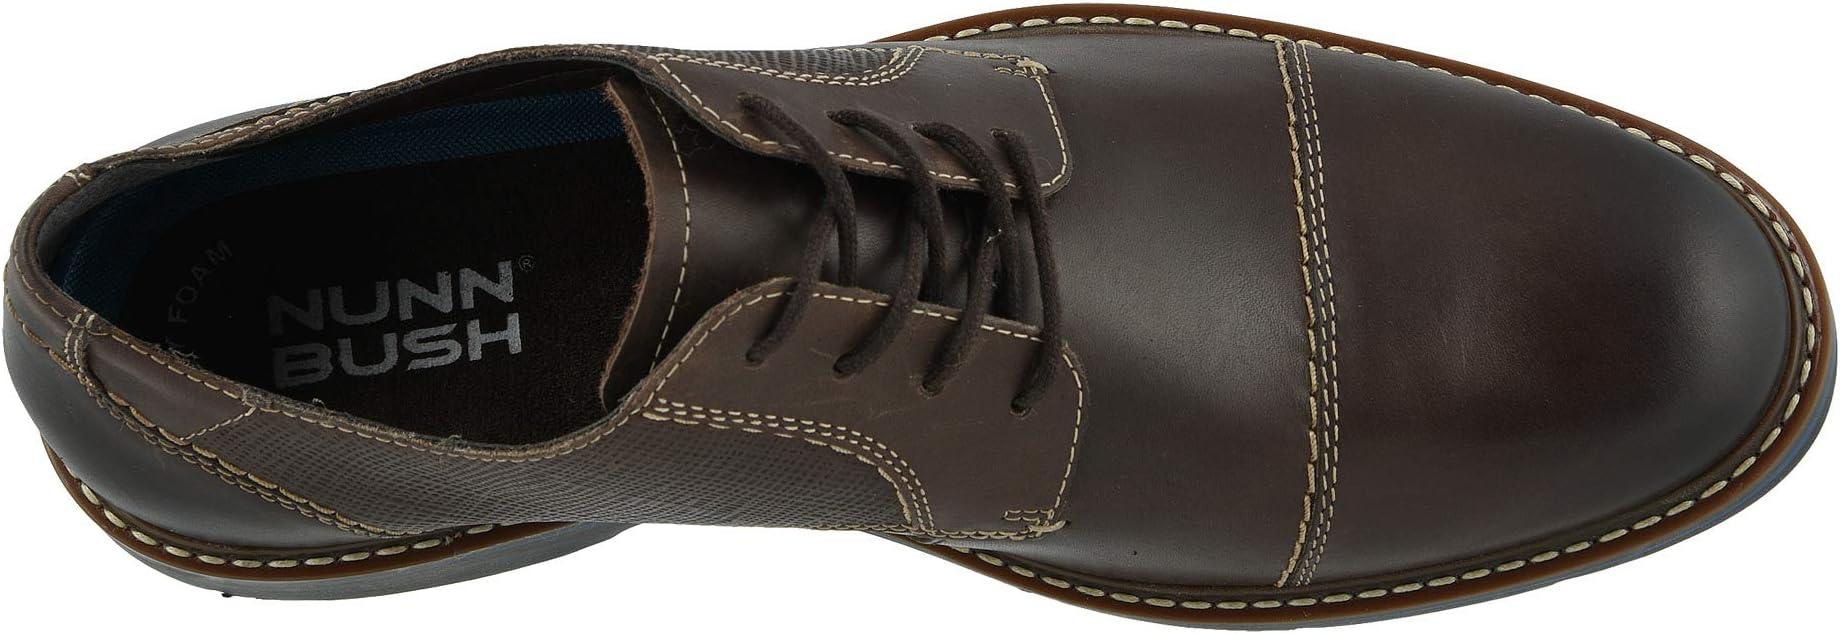 Nunn Bush Pasadena Cap Toe Oxford | Men's shoes | 2020 Newest